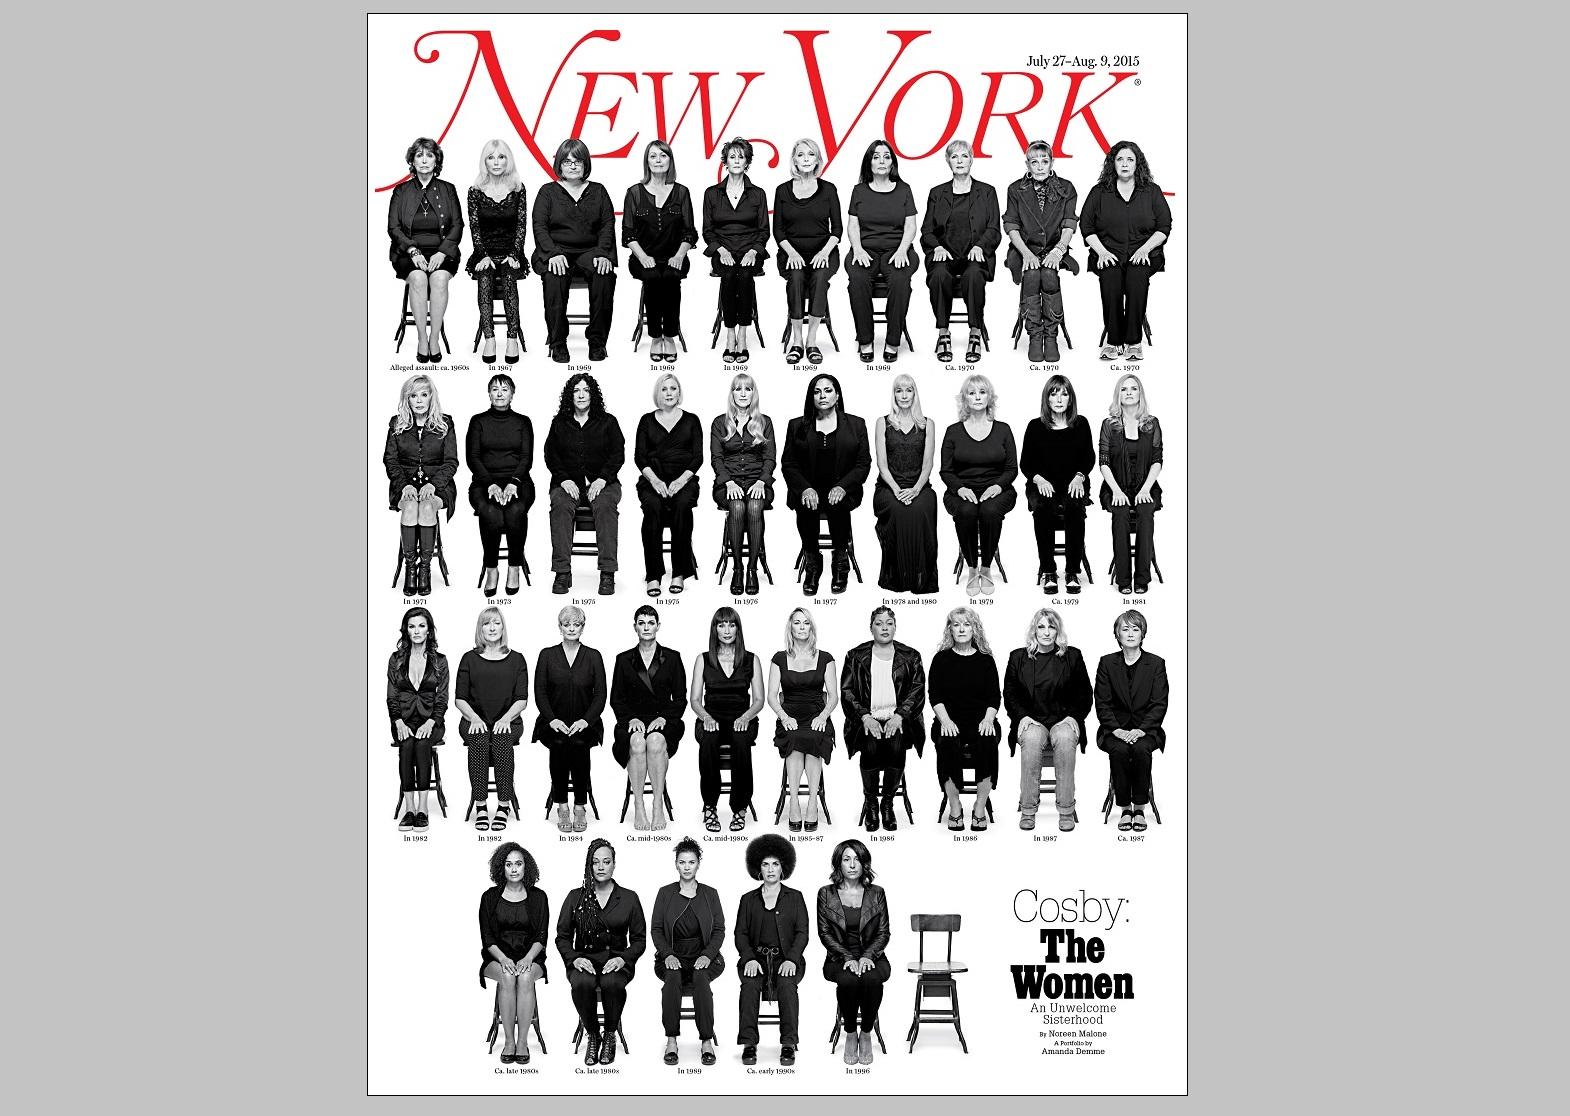 New York magazine crosby cover